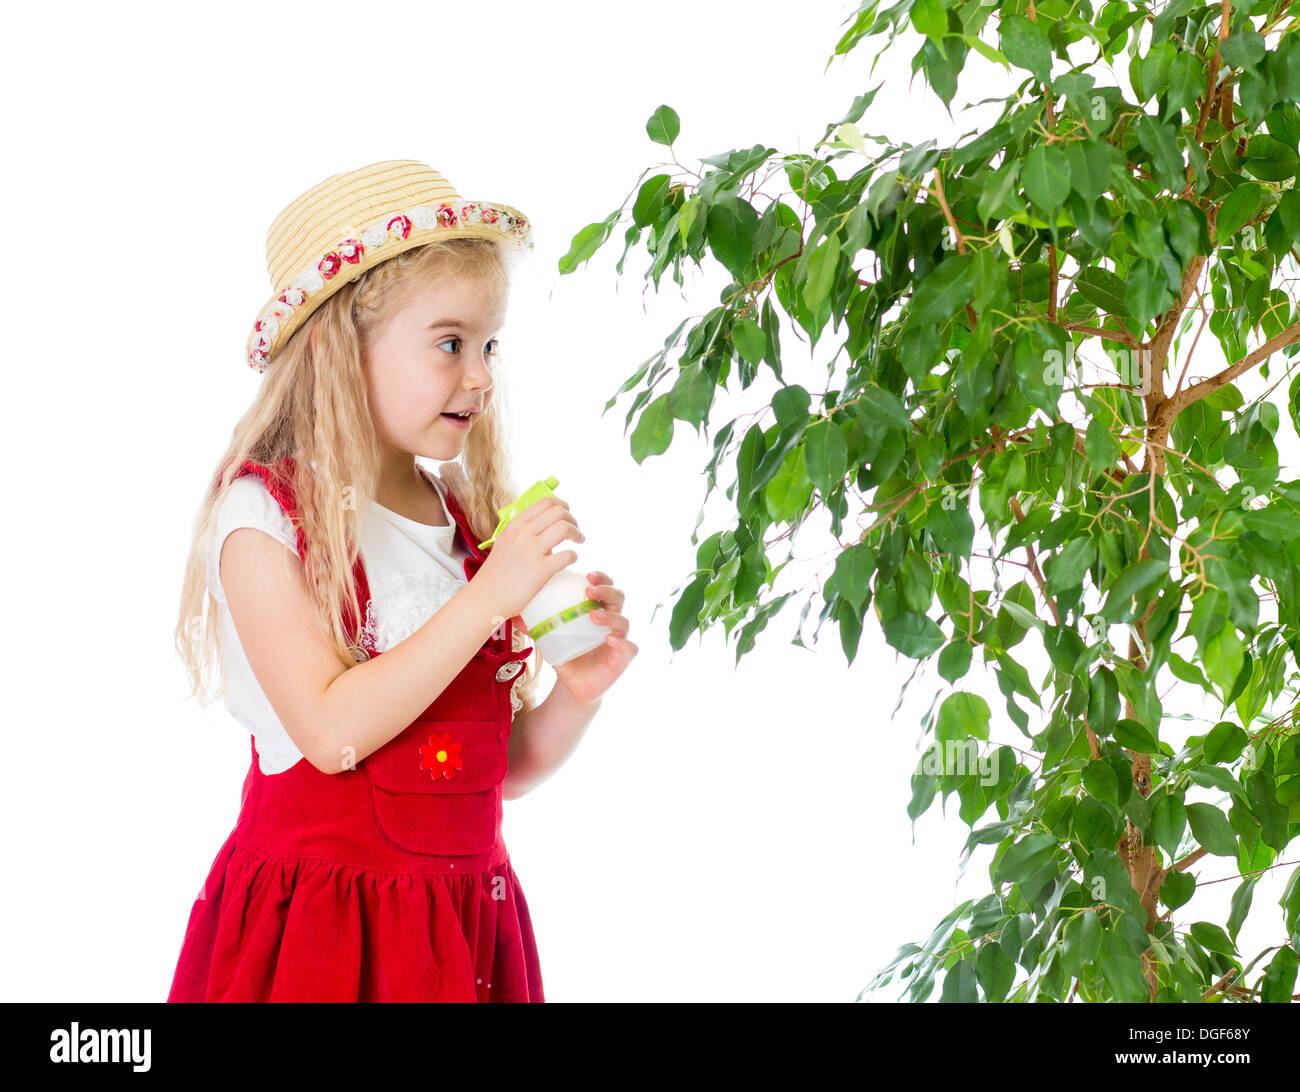 stock photo gardener kid wets or waters tree